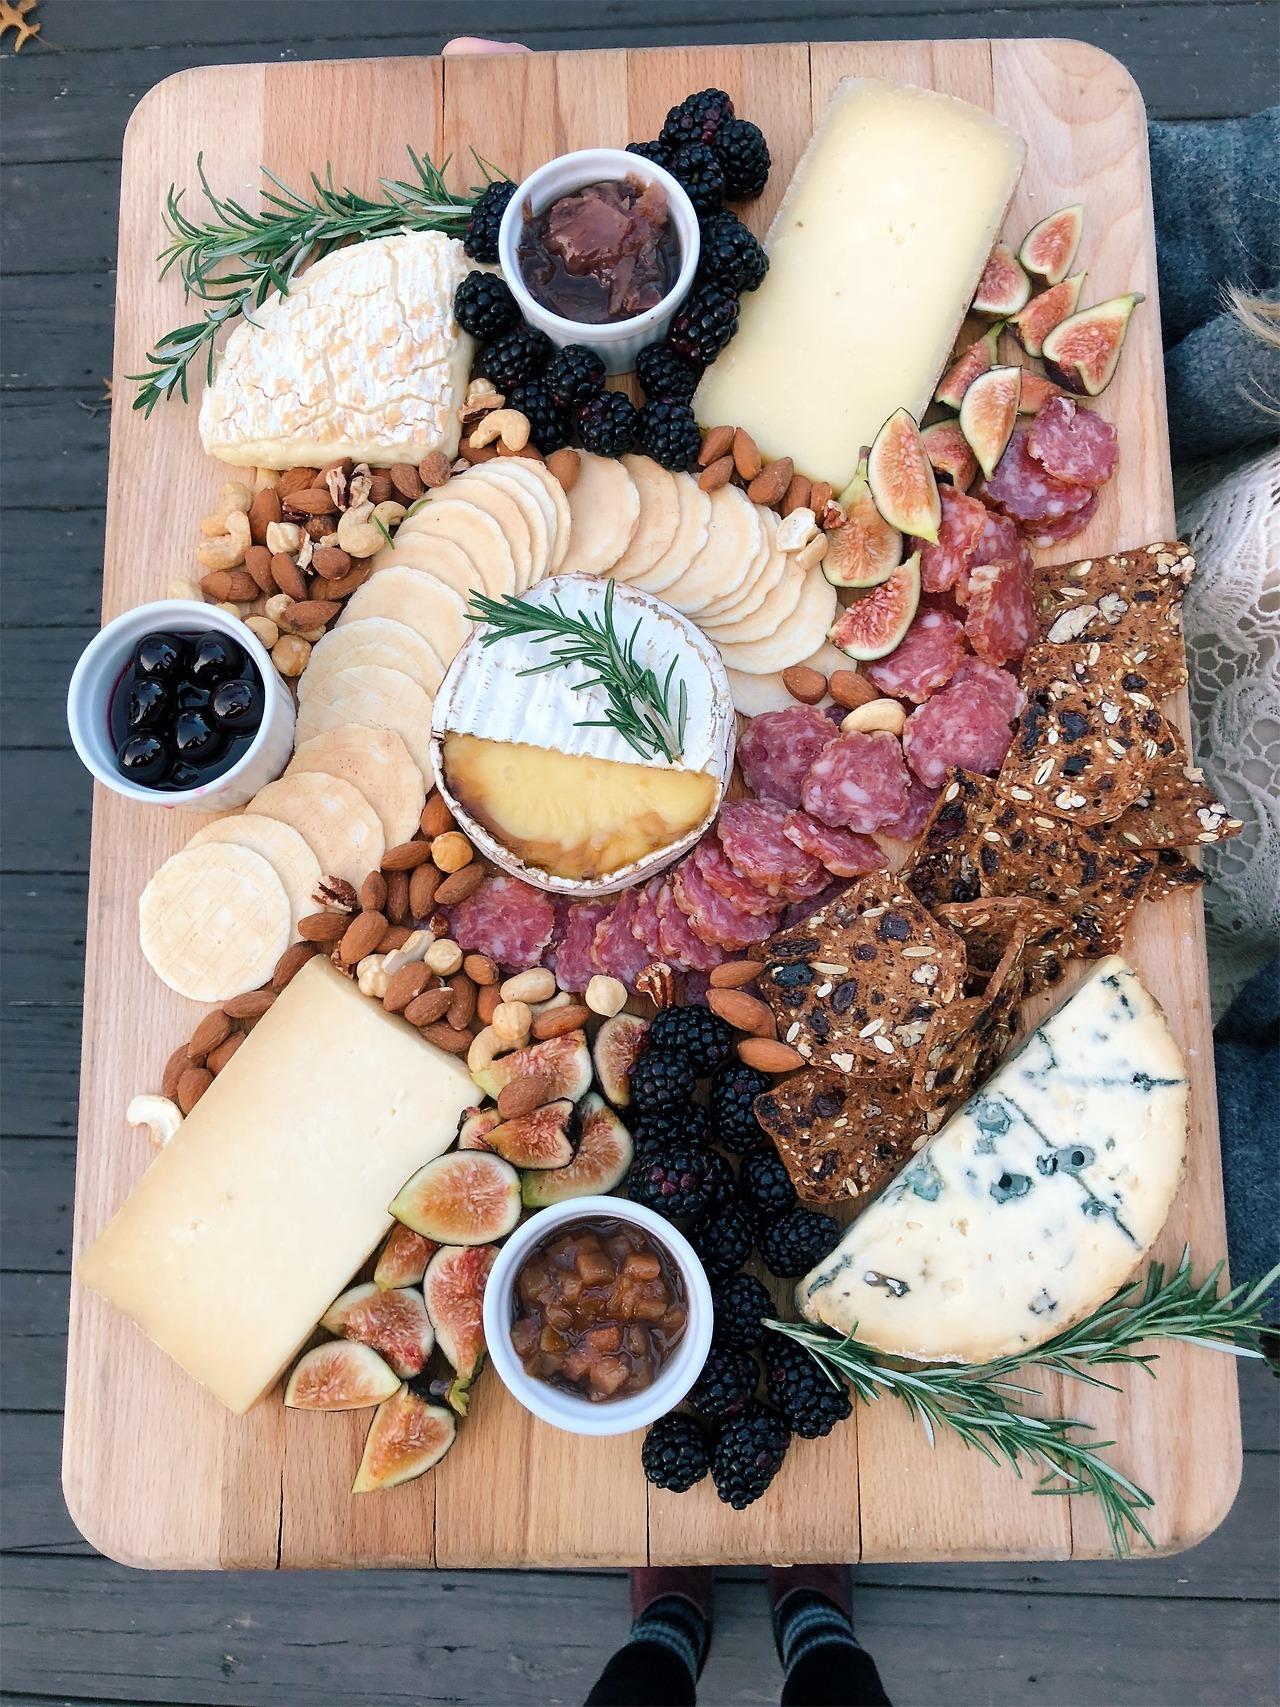 Jasper Hill Farm x Whole Foods - Cheese Pairings